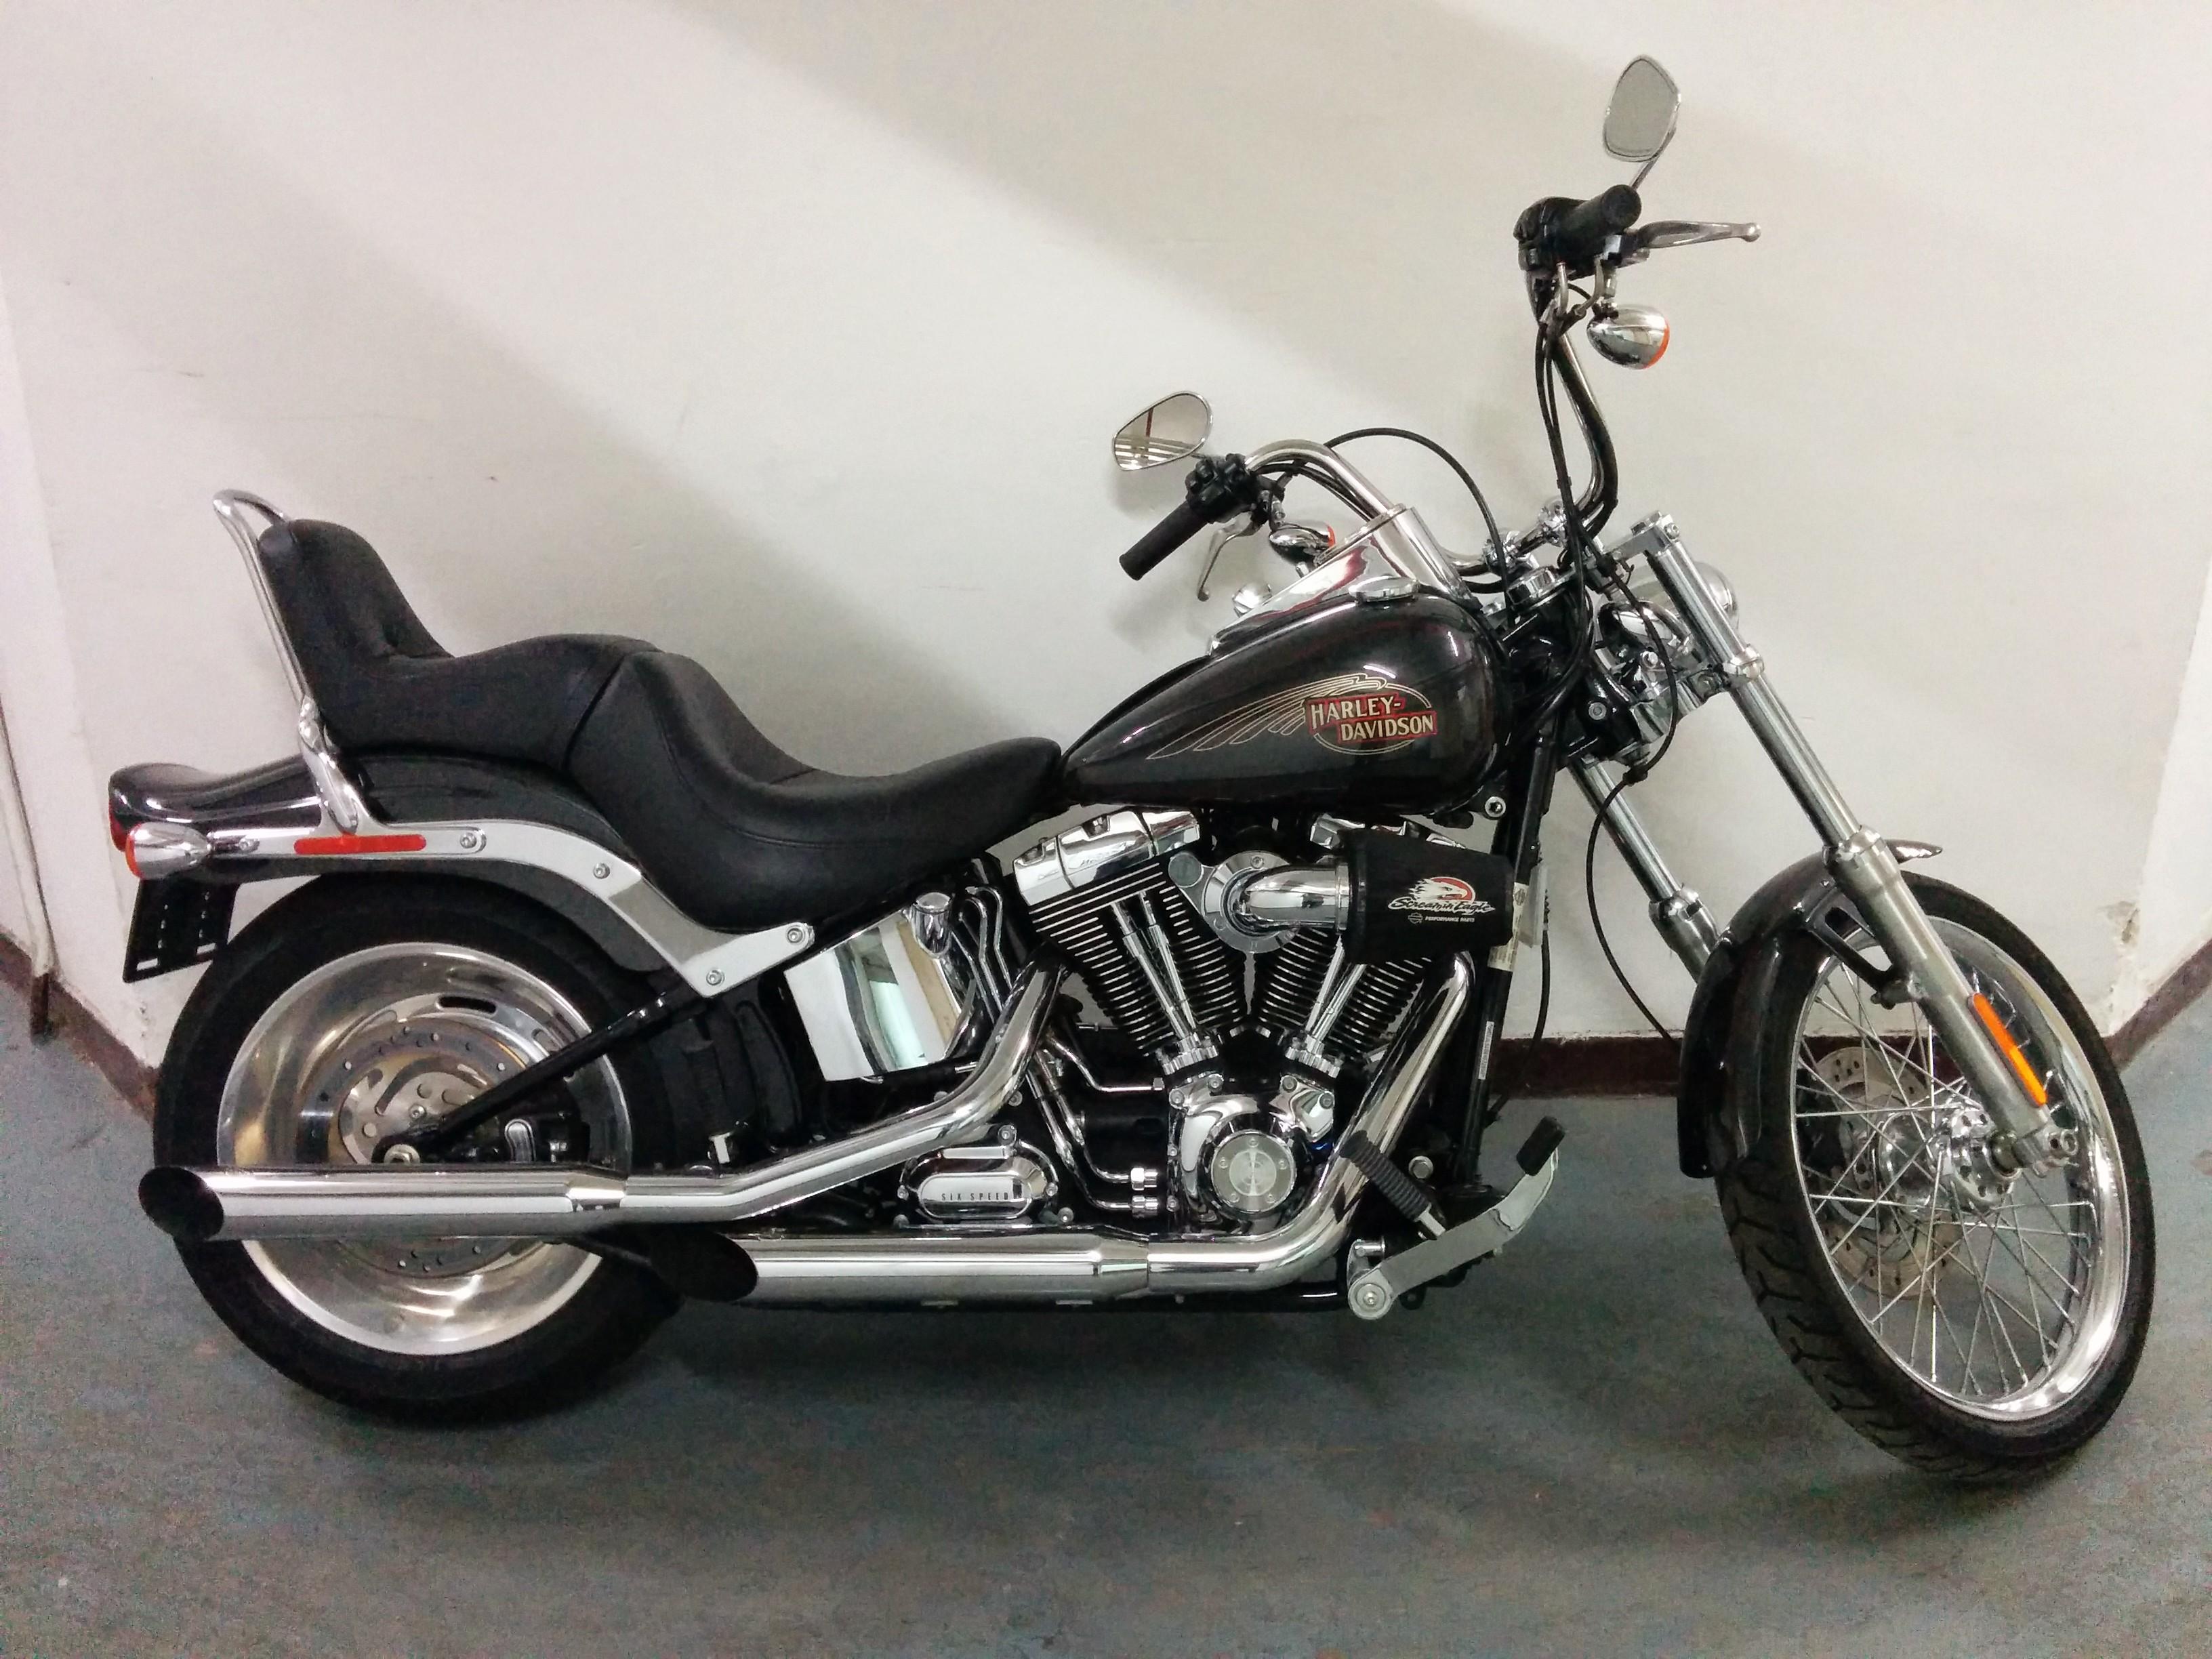 2008 Harley Davidson Fxstc Softail Custom Sold